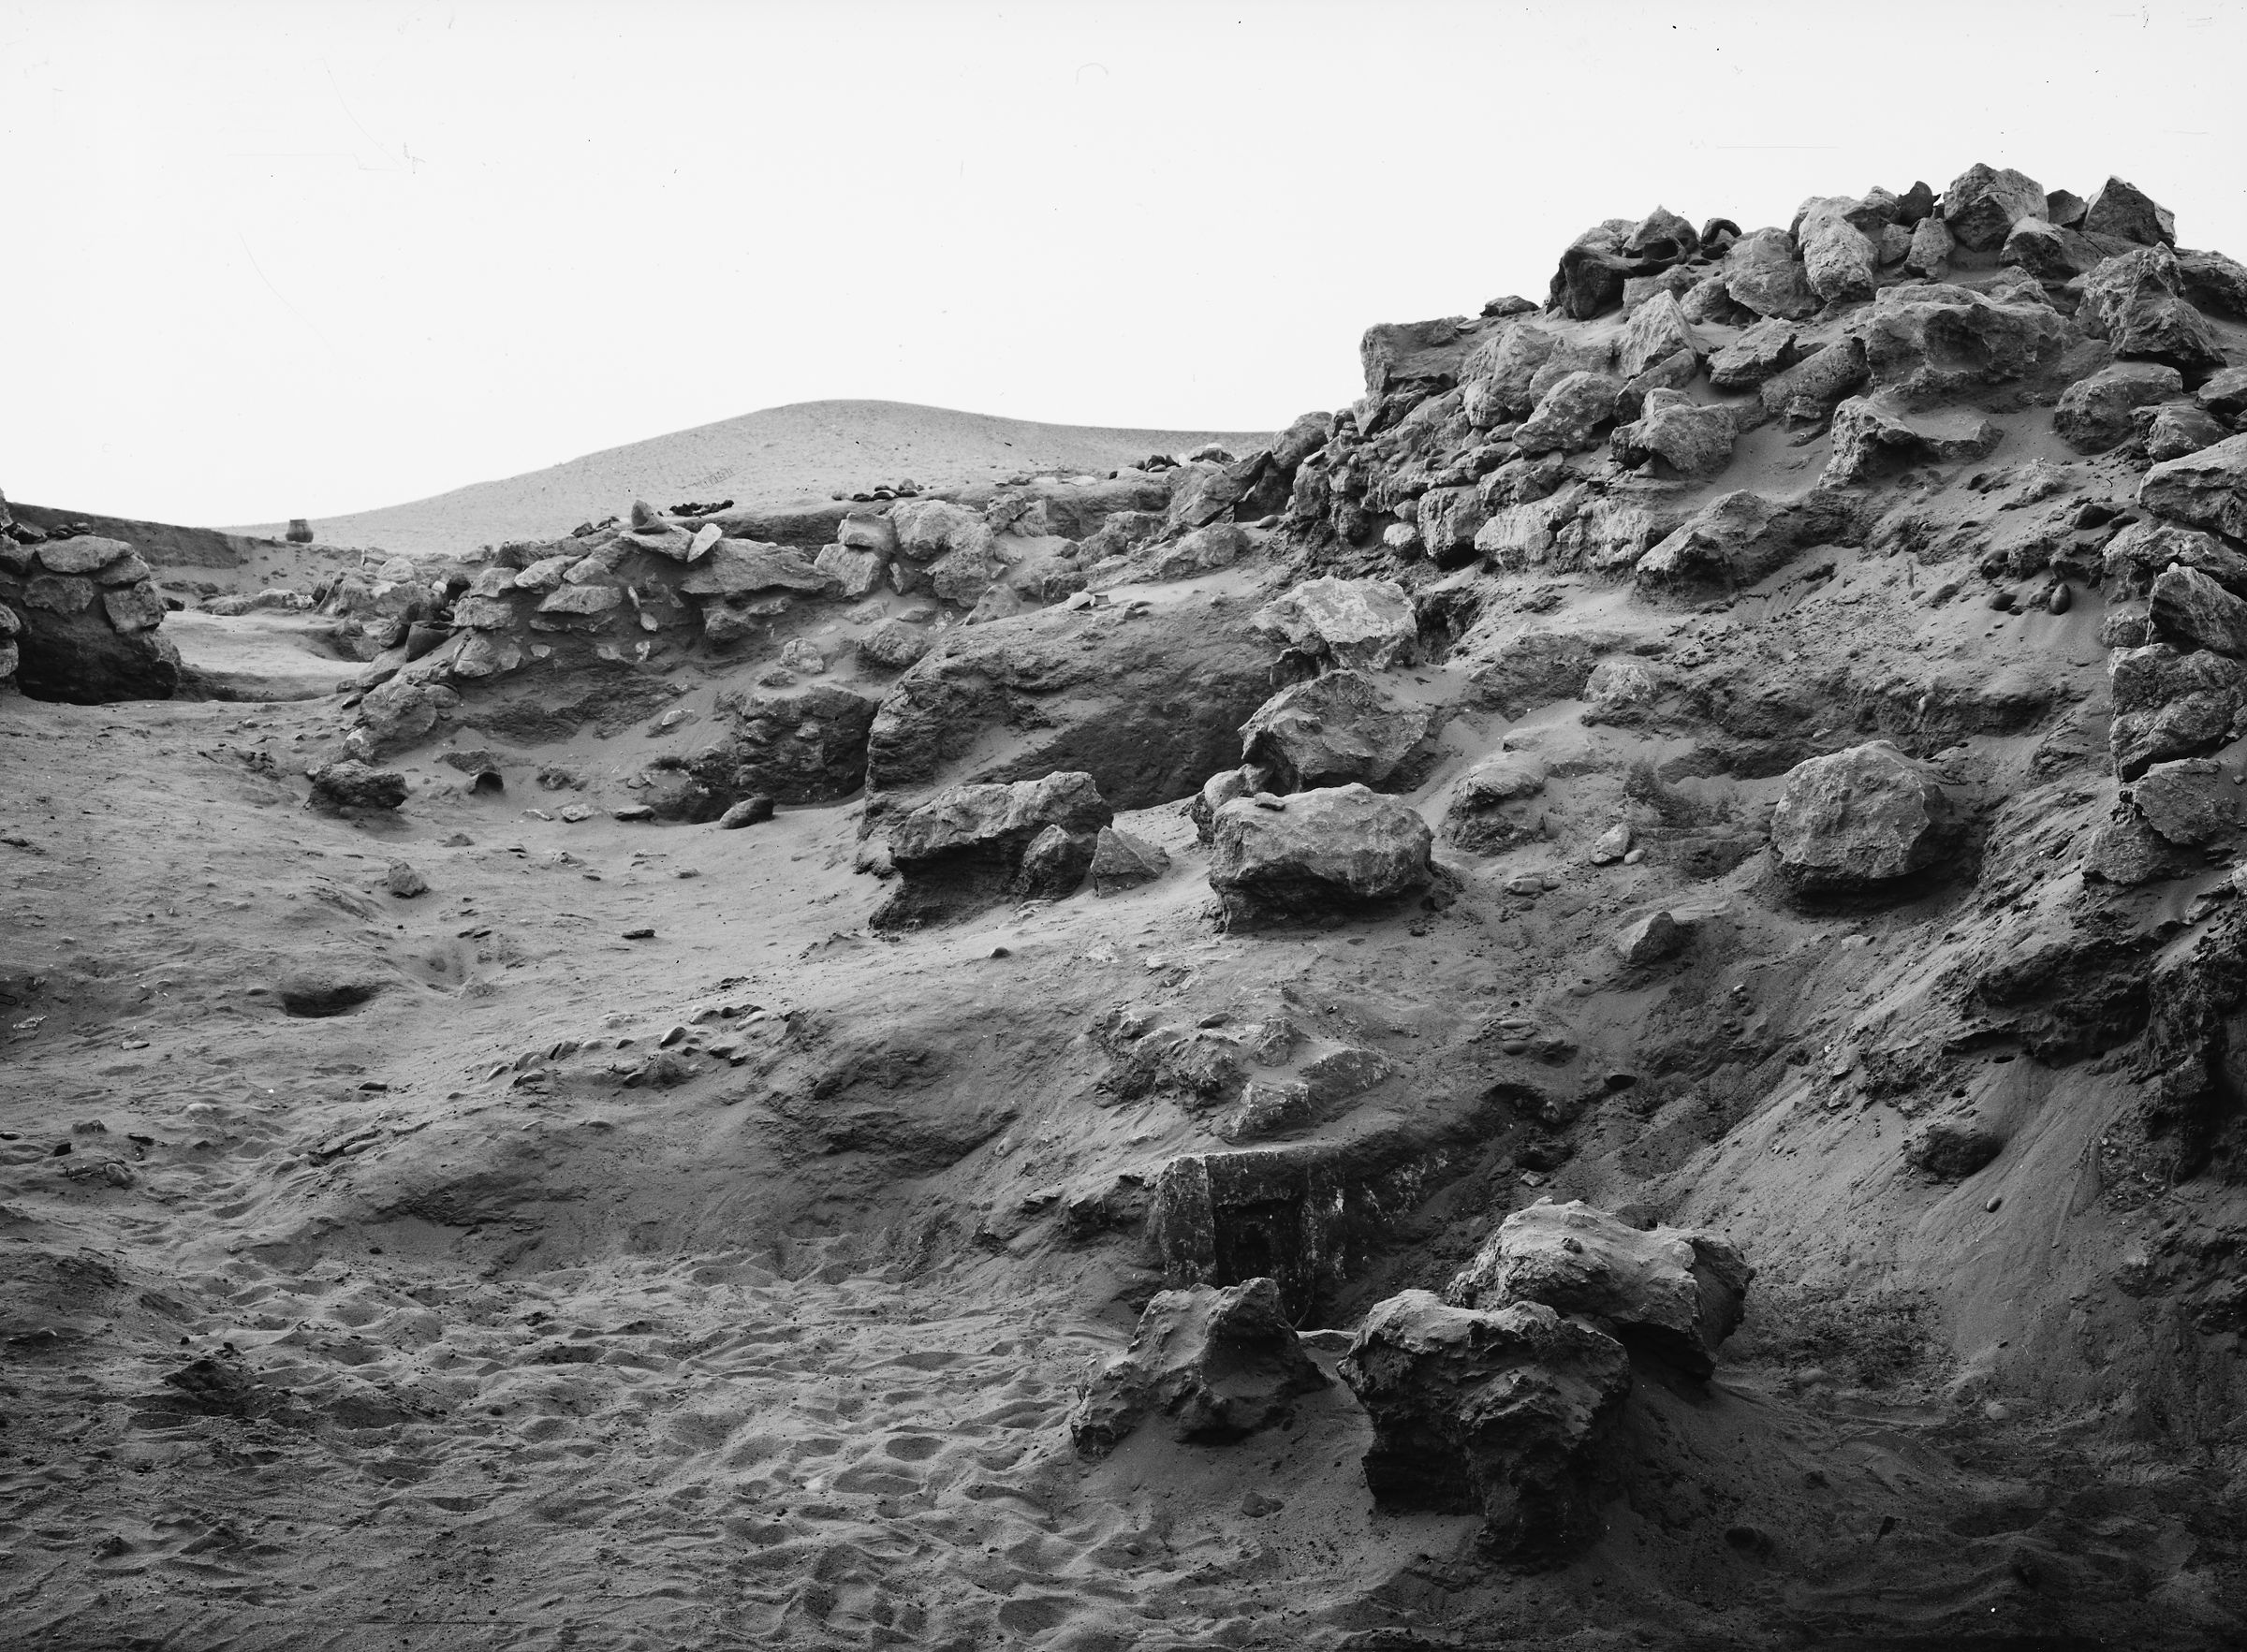 Wadi Cemetery (Reisner; north of W. Cem): Site: Giza; View: GW 3